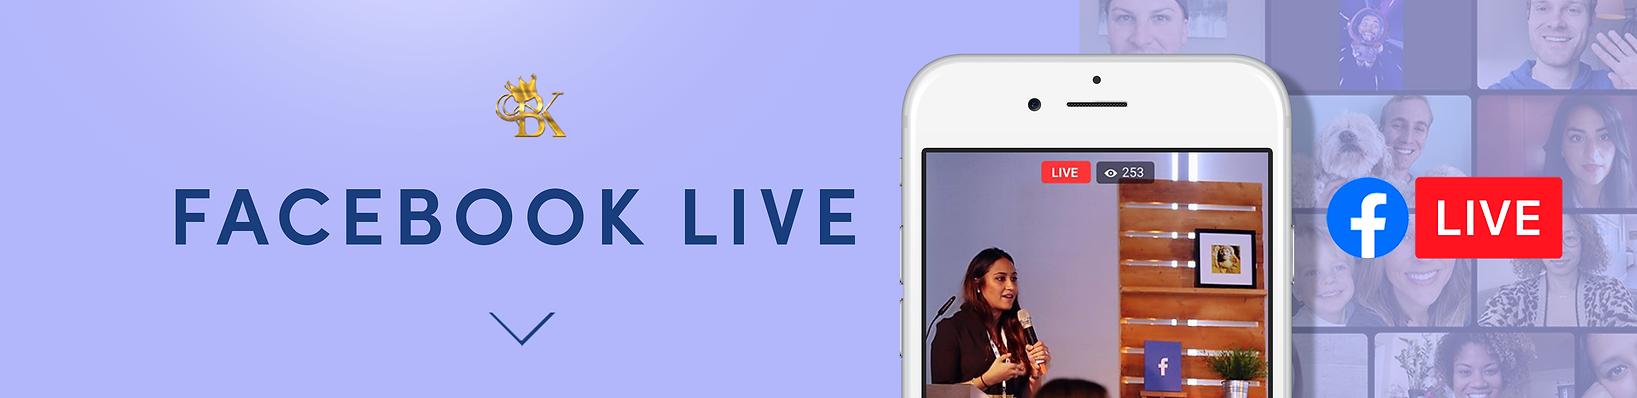 bkim facebook live.png